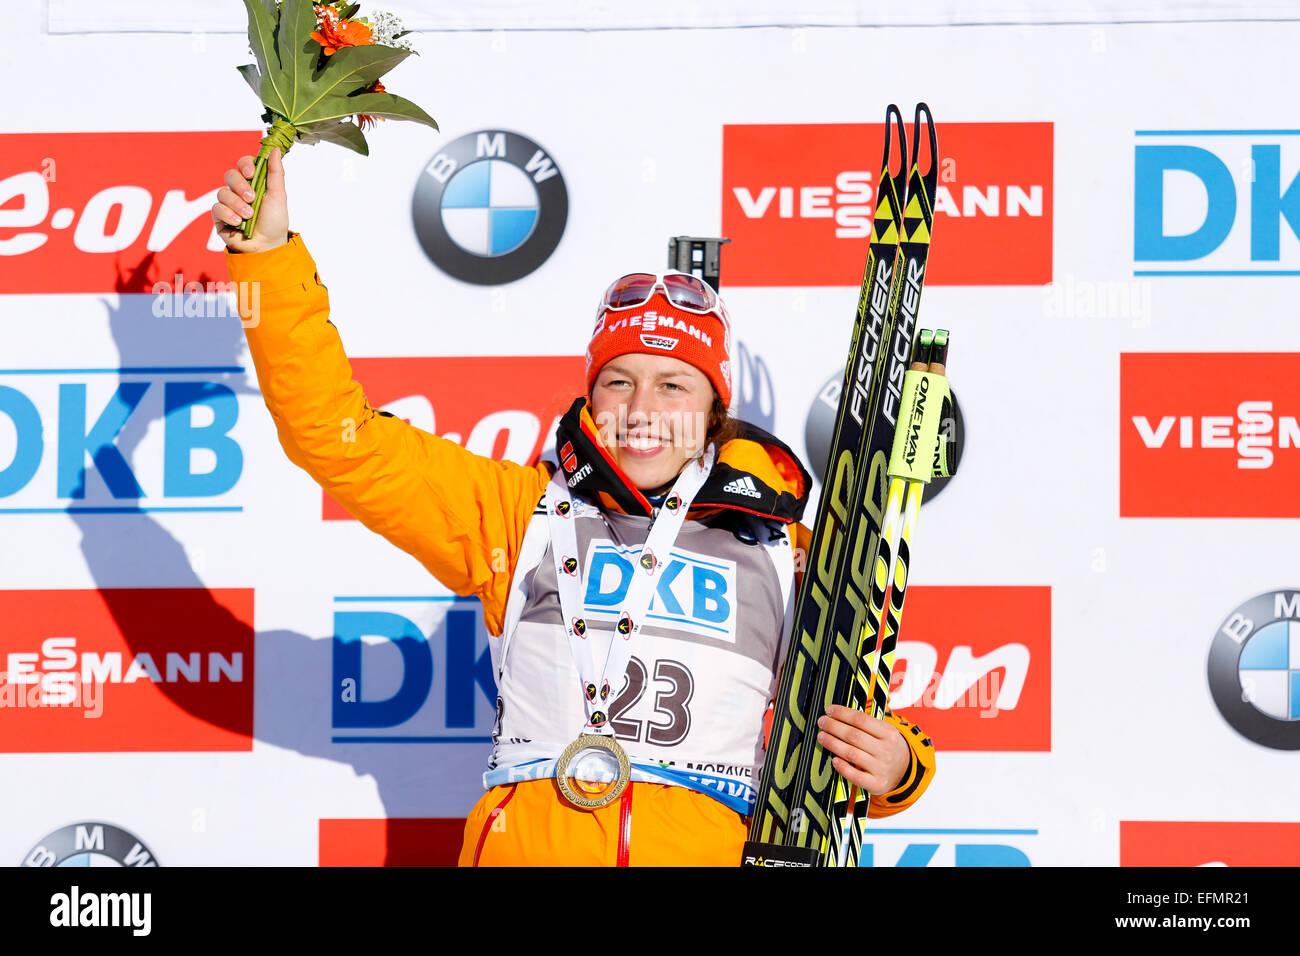 Nove Mesto Na Morave, Tschechische Republik. 7. Februar 2015. Laura Dahlmeier gewann die Goldmedaille bei den Biathlon Stockbild